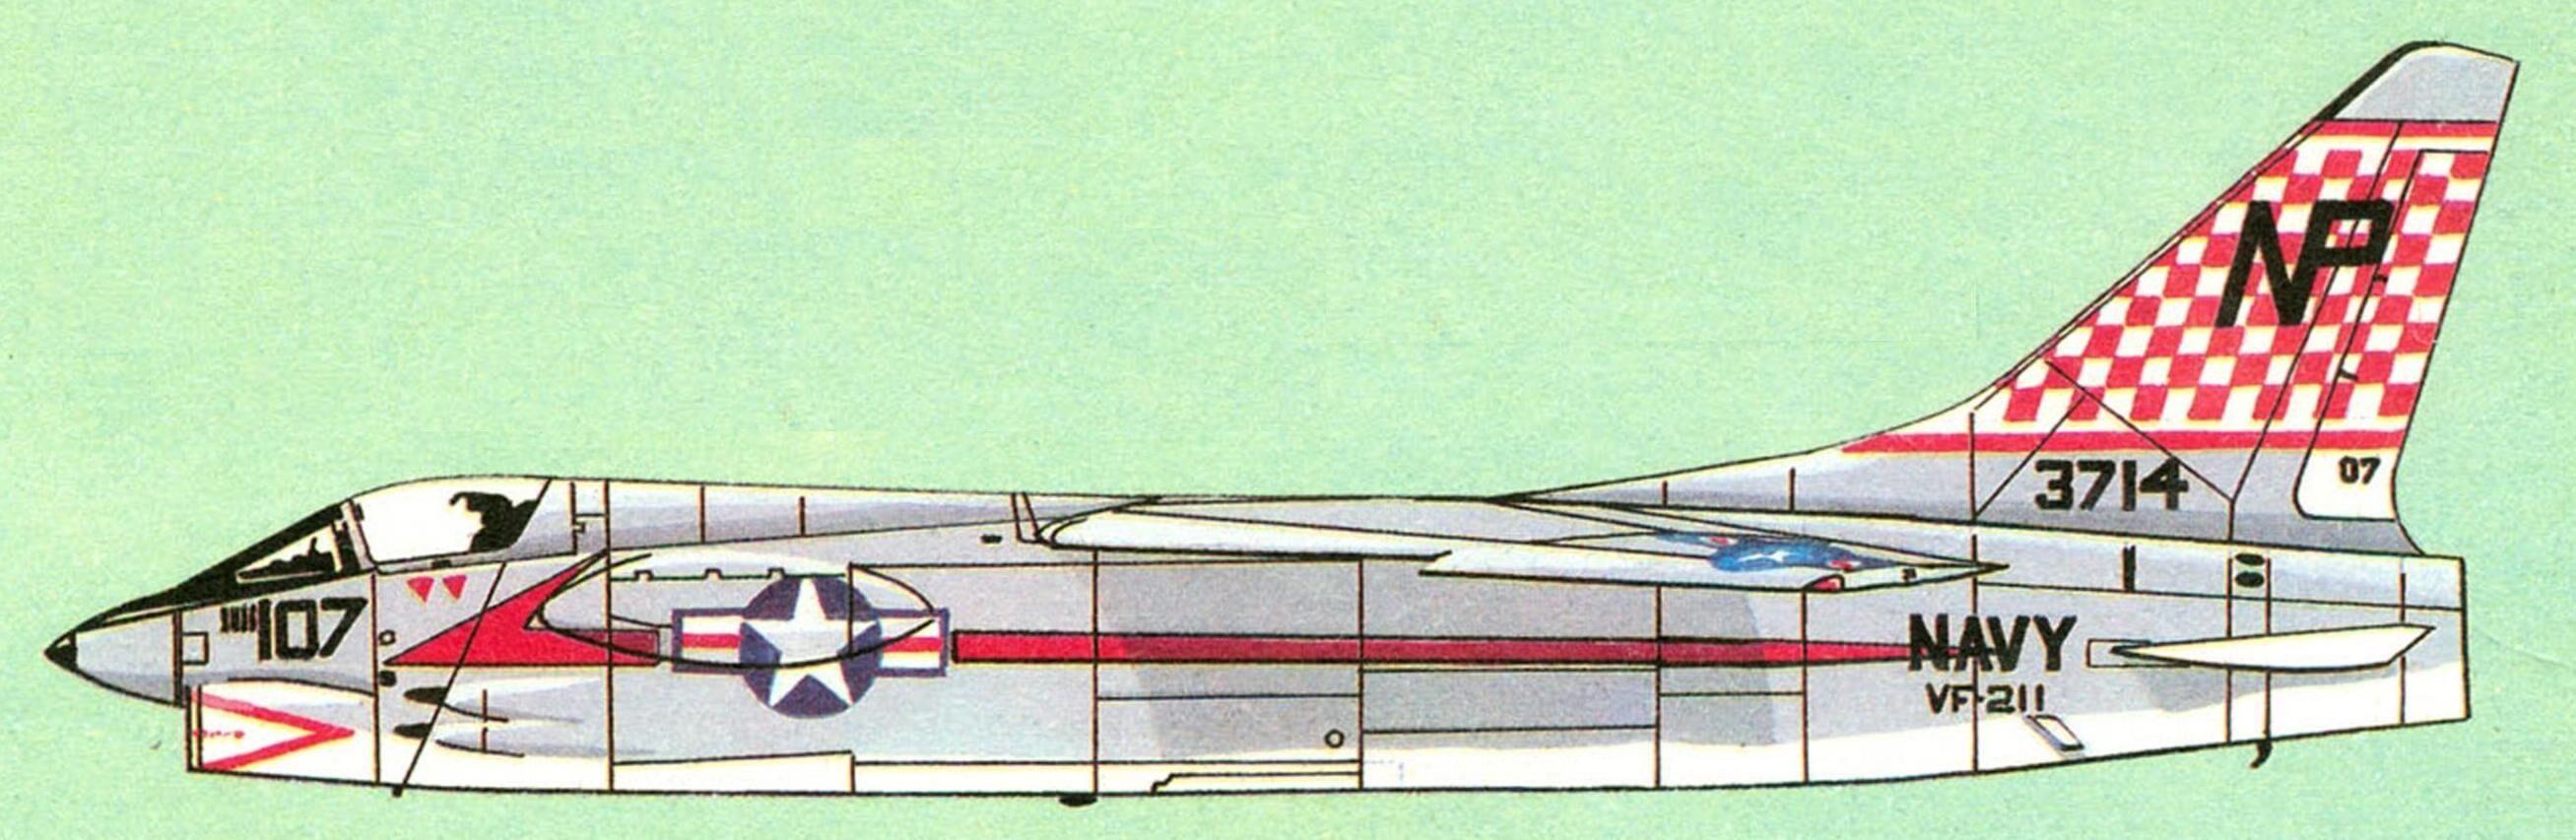 F8U-1 (F-8A) эскадрильи VF-211 «Red Checkertails», авианосец «Hancock».